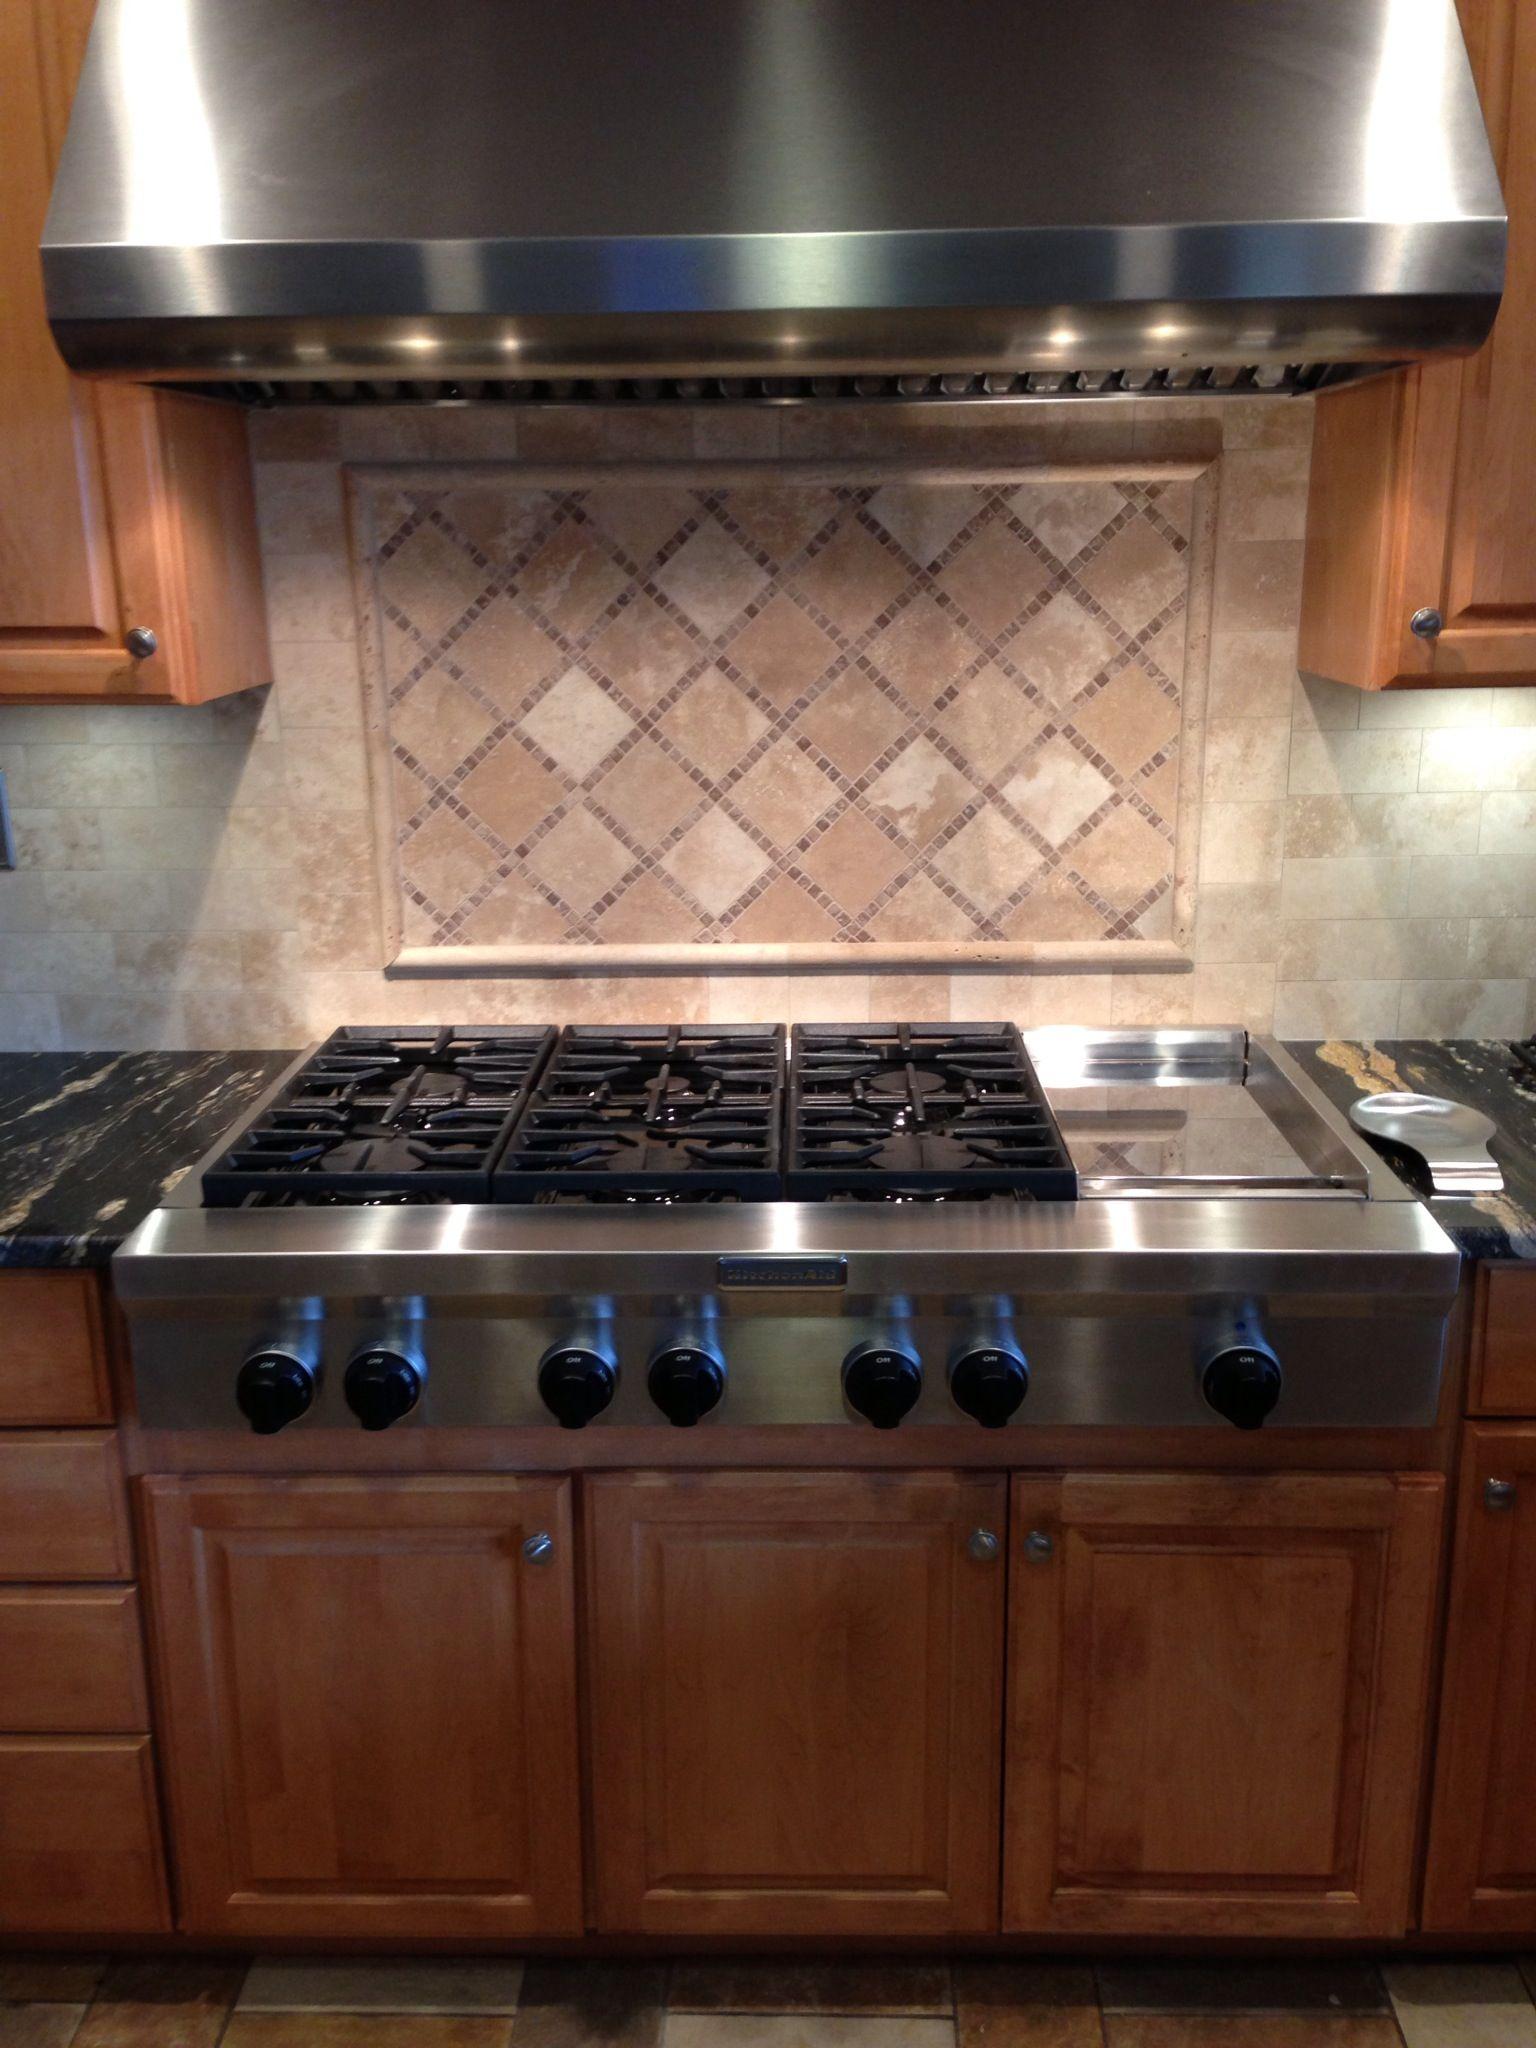 Rustic kitchen backsplash tile icontrall for - Backsplash tile rustic ...